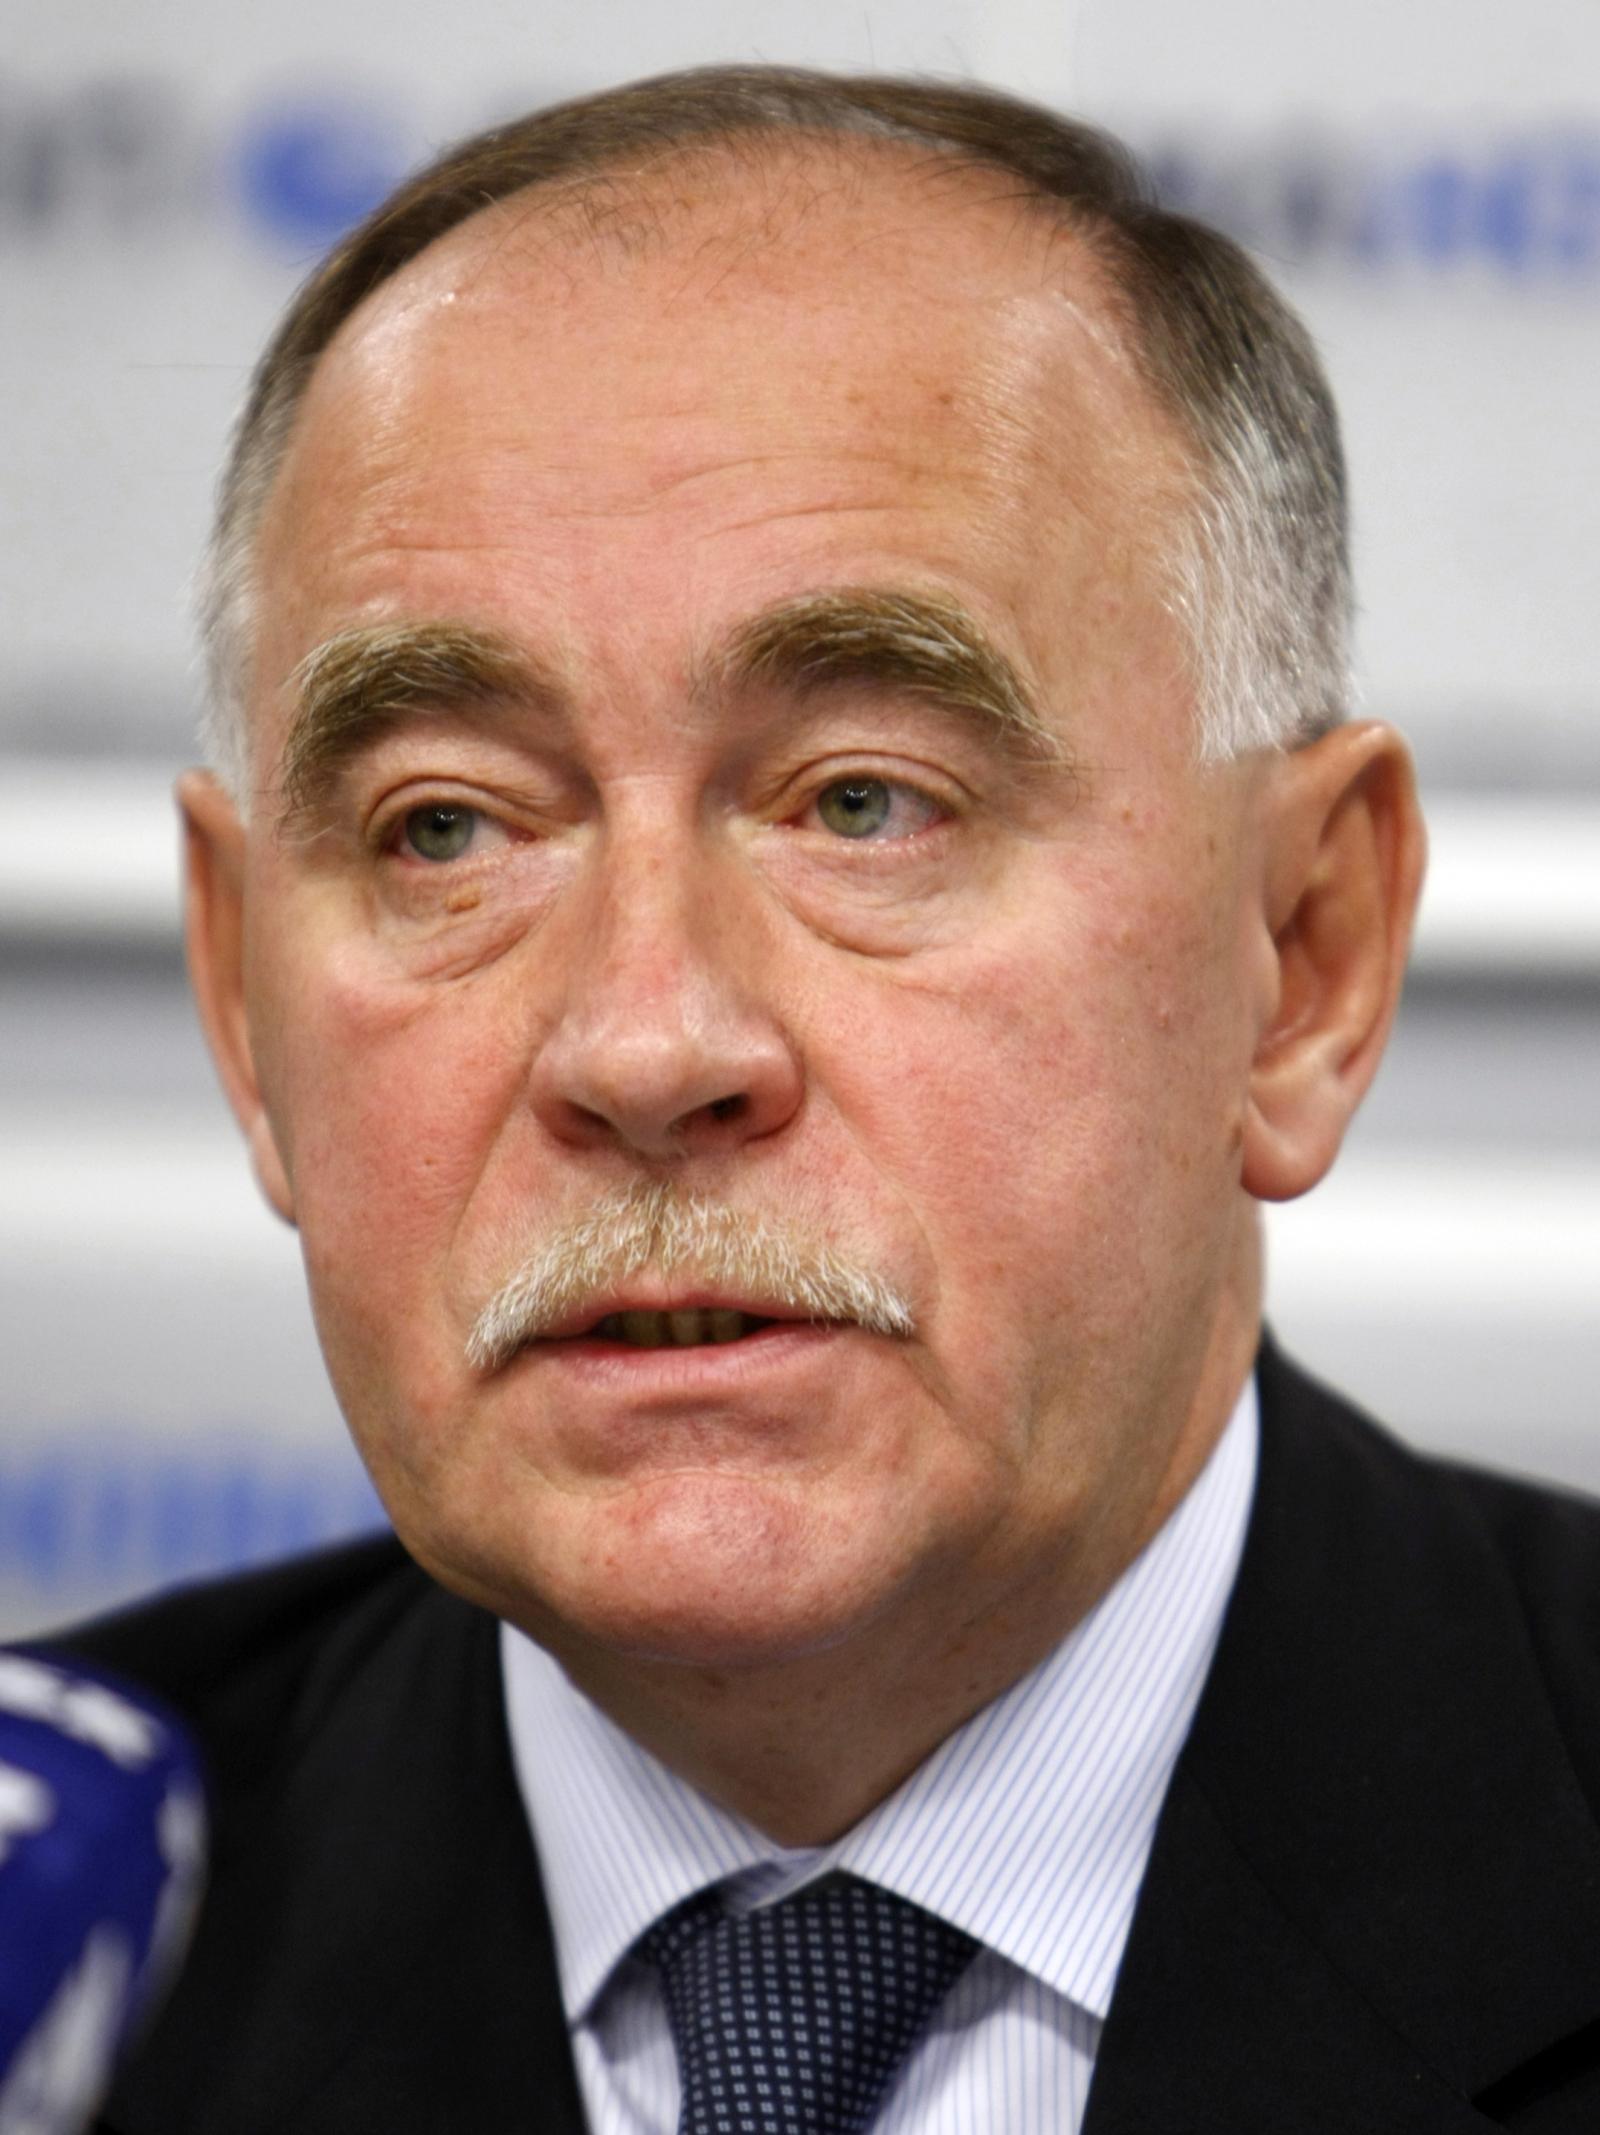 Viktor Ivanov, Viktor Ivanov, head of Russia's Federal Drug Control Agency (Reuters)